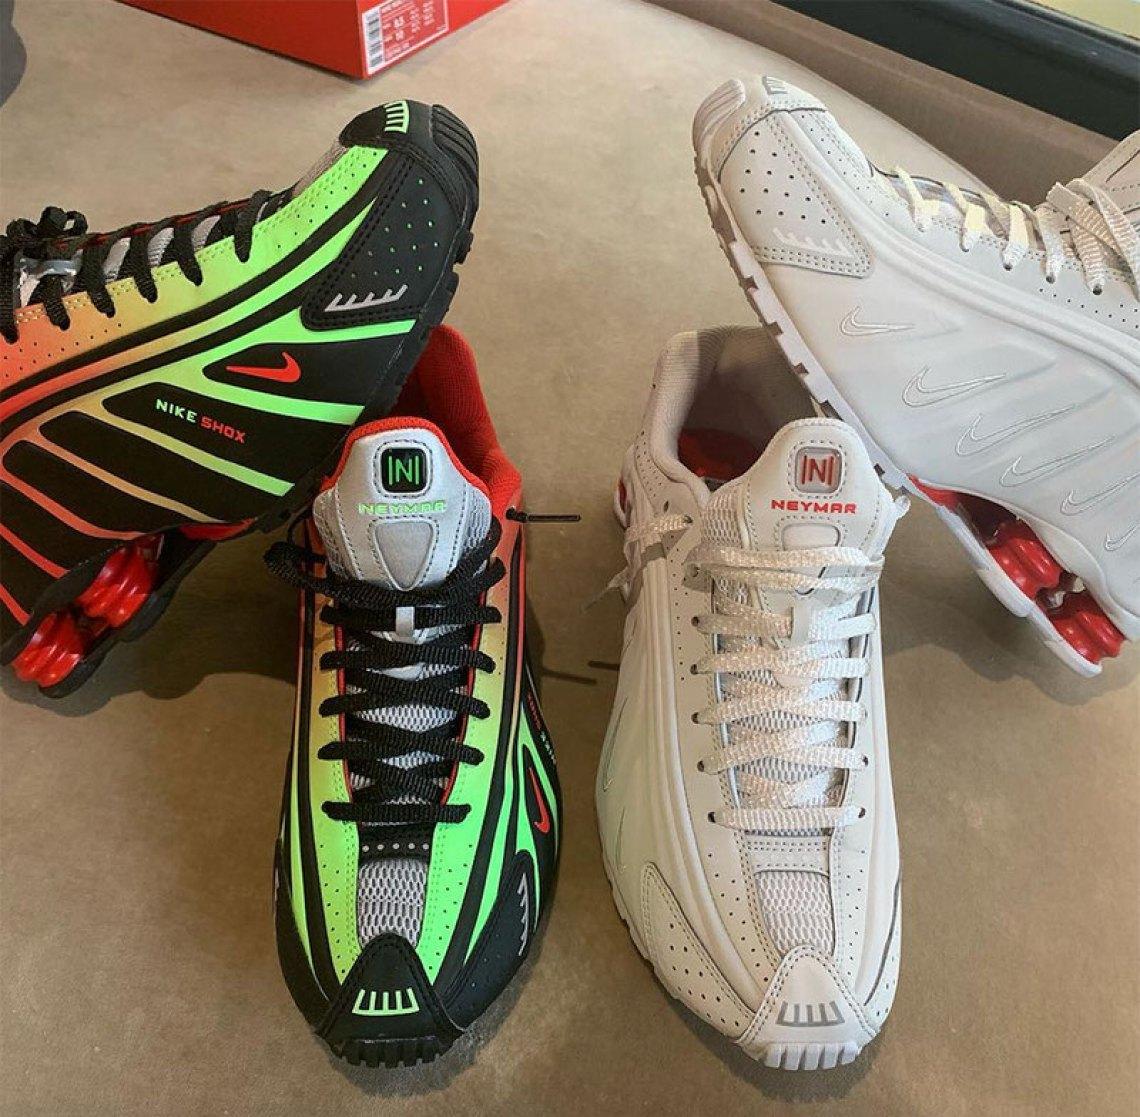 Neymar x Nike Shox R4